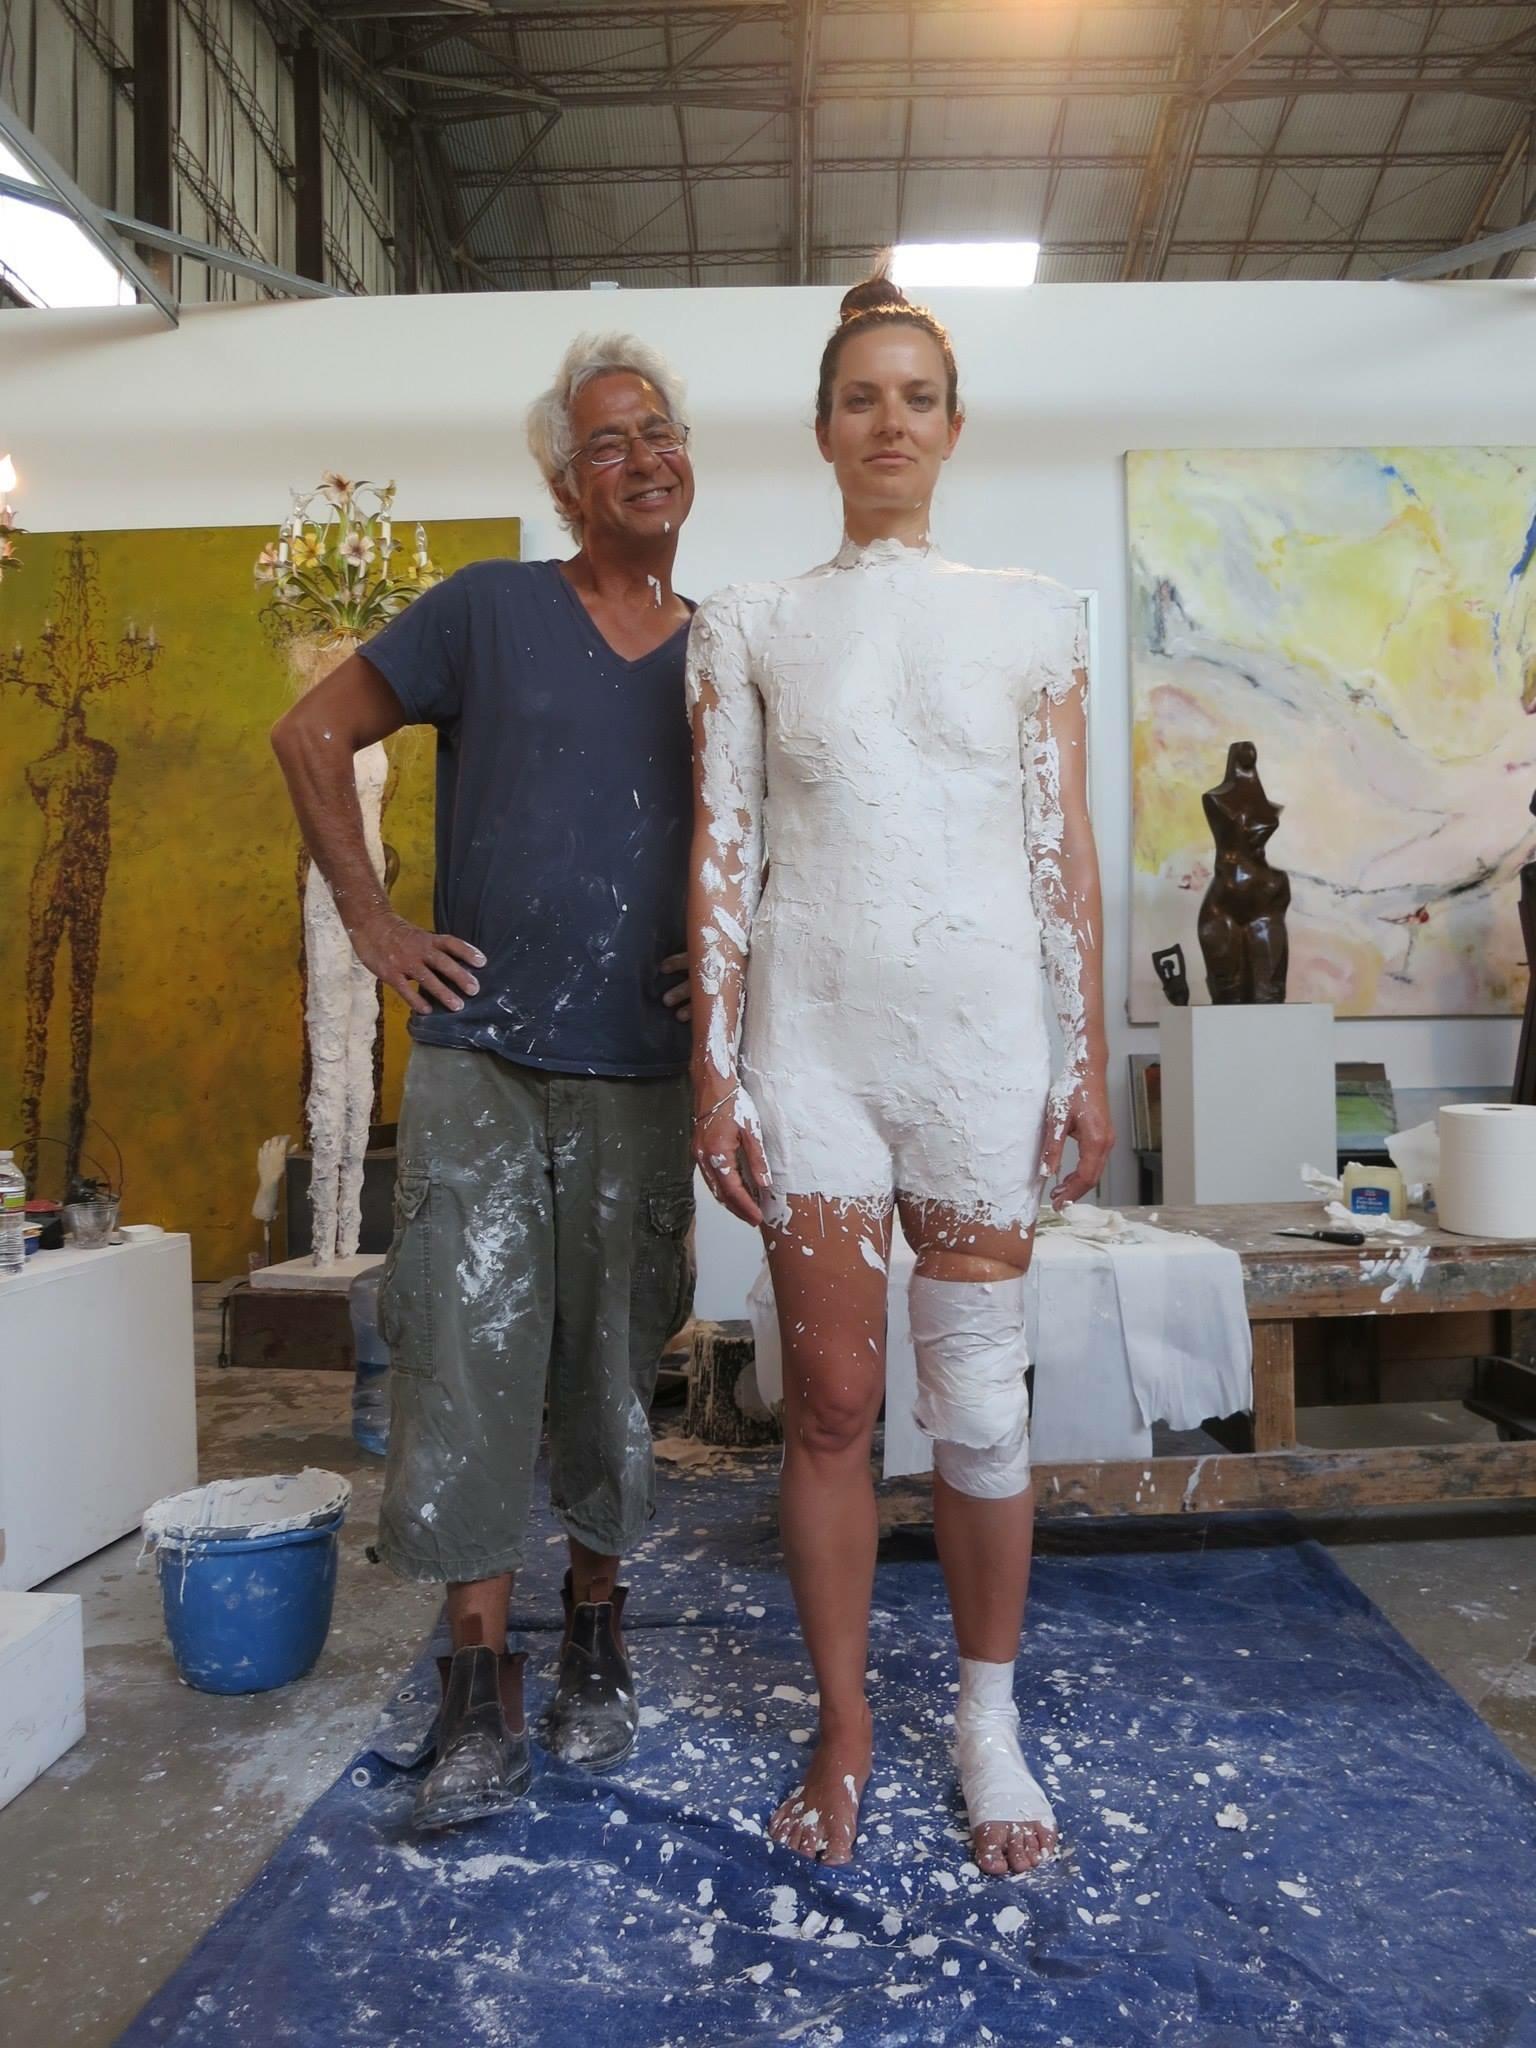 57 Studio artmaking.JPG